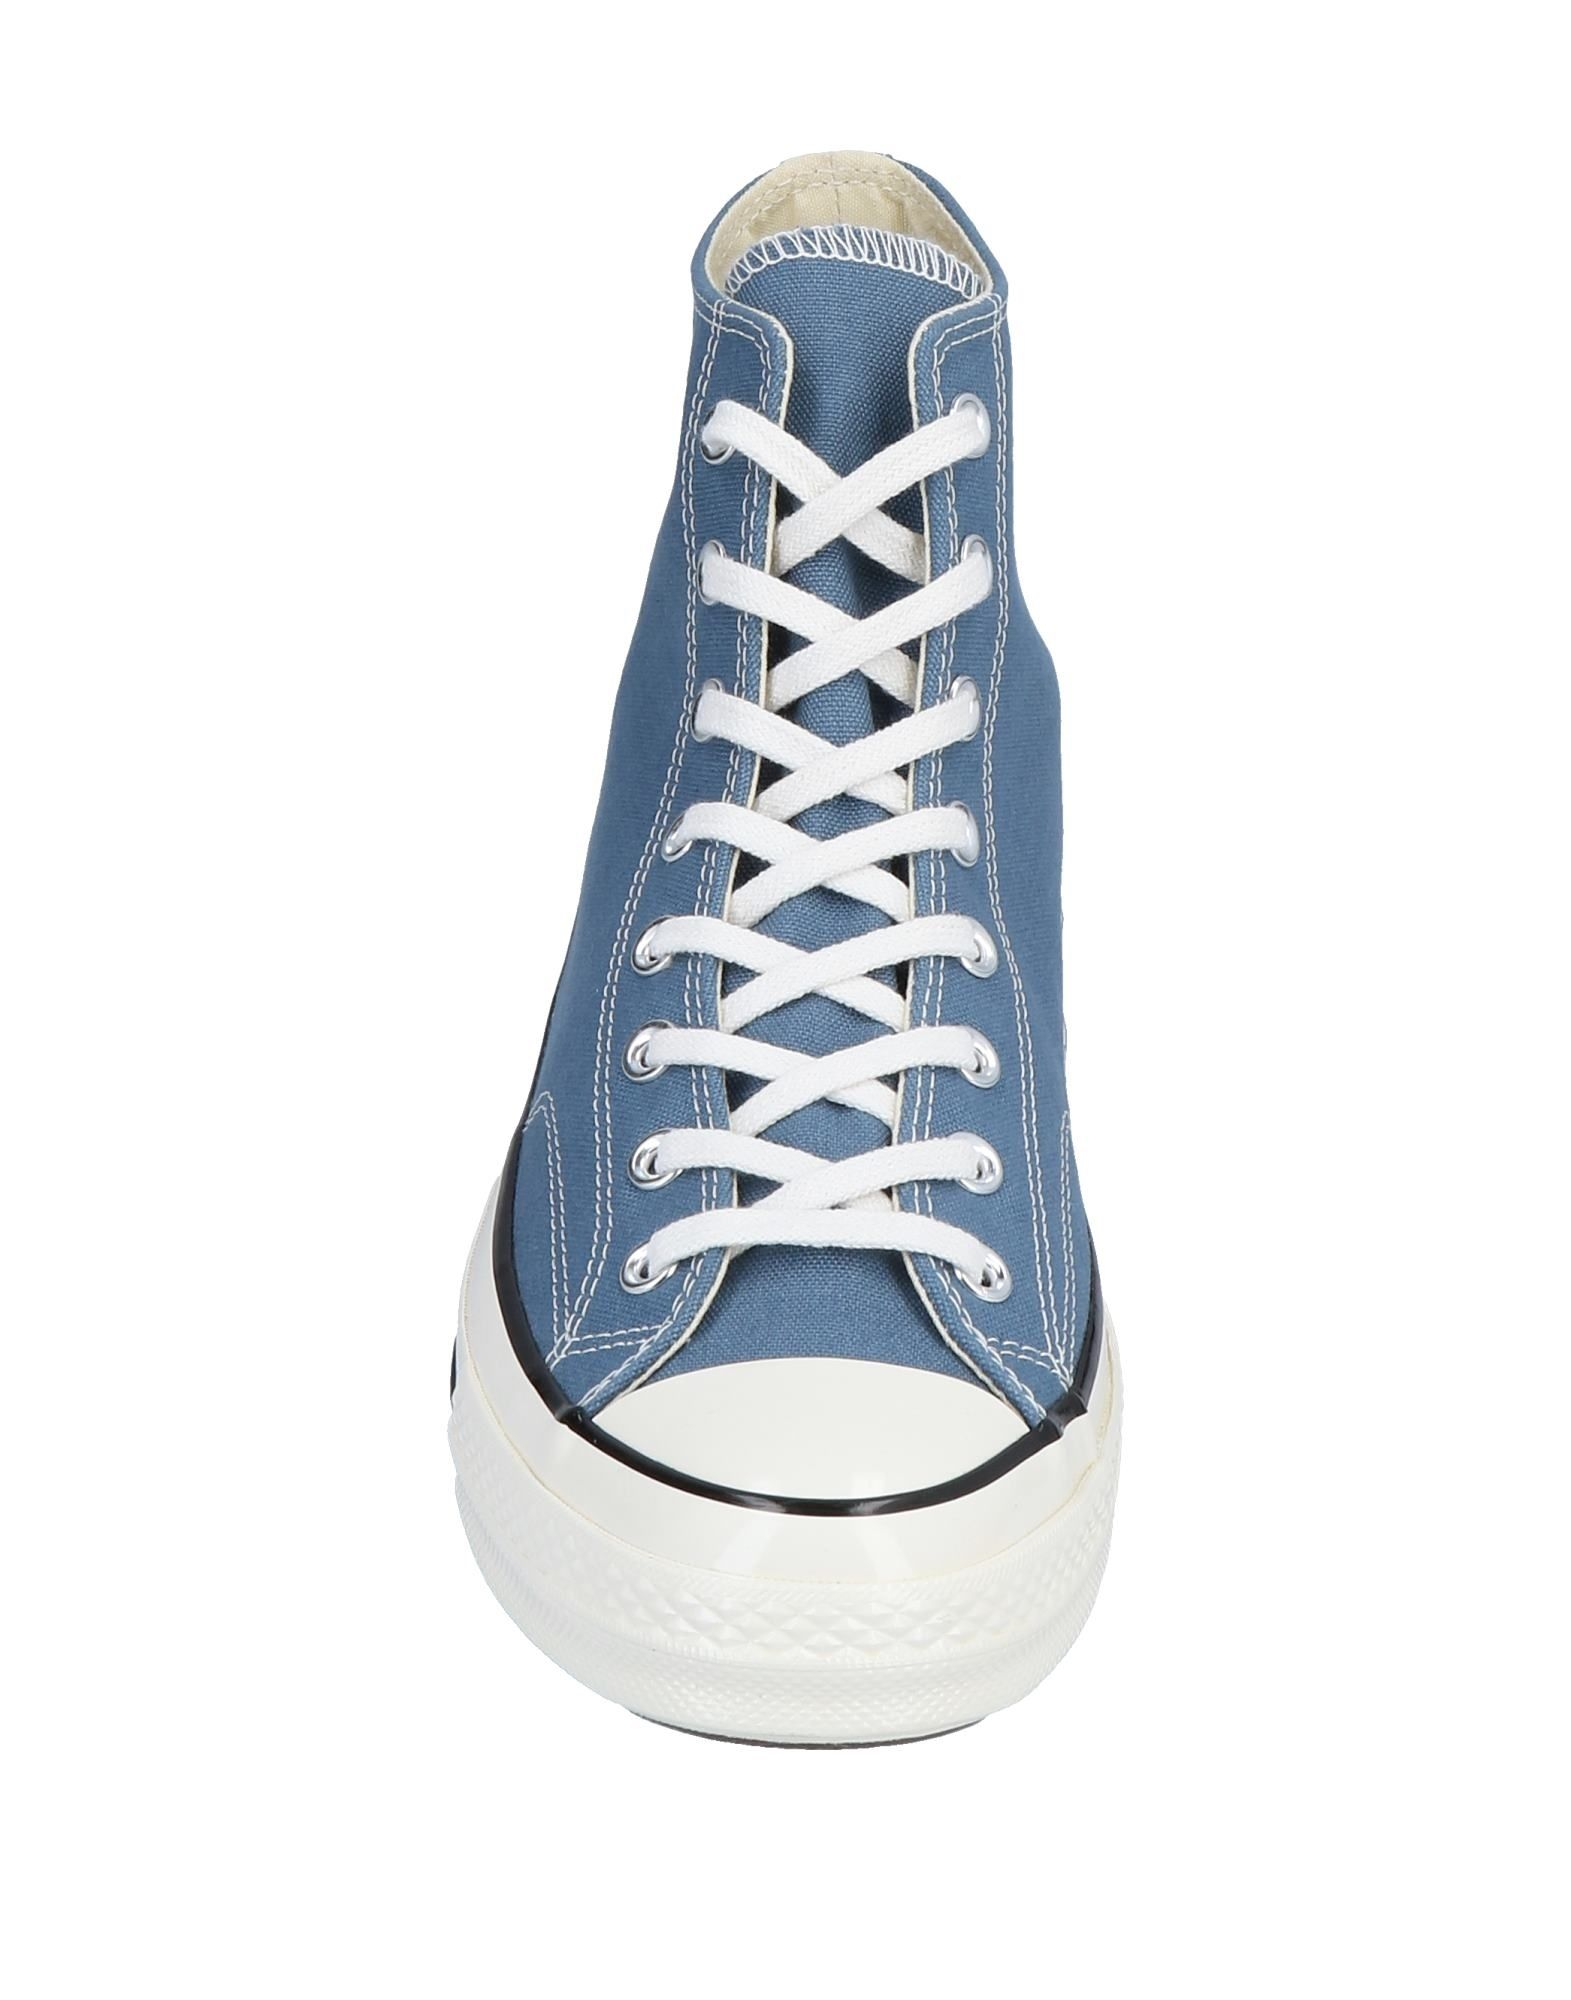 Converse Sneakers - Men Converse Sneakers online - on  United Kingdom - online 11563119MI 4f91df